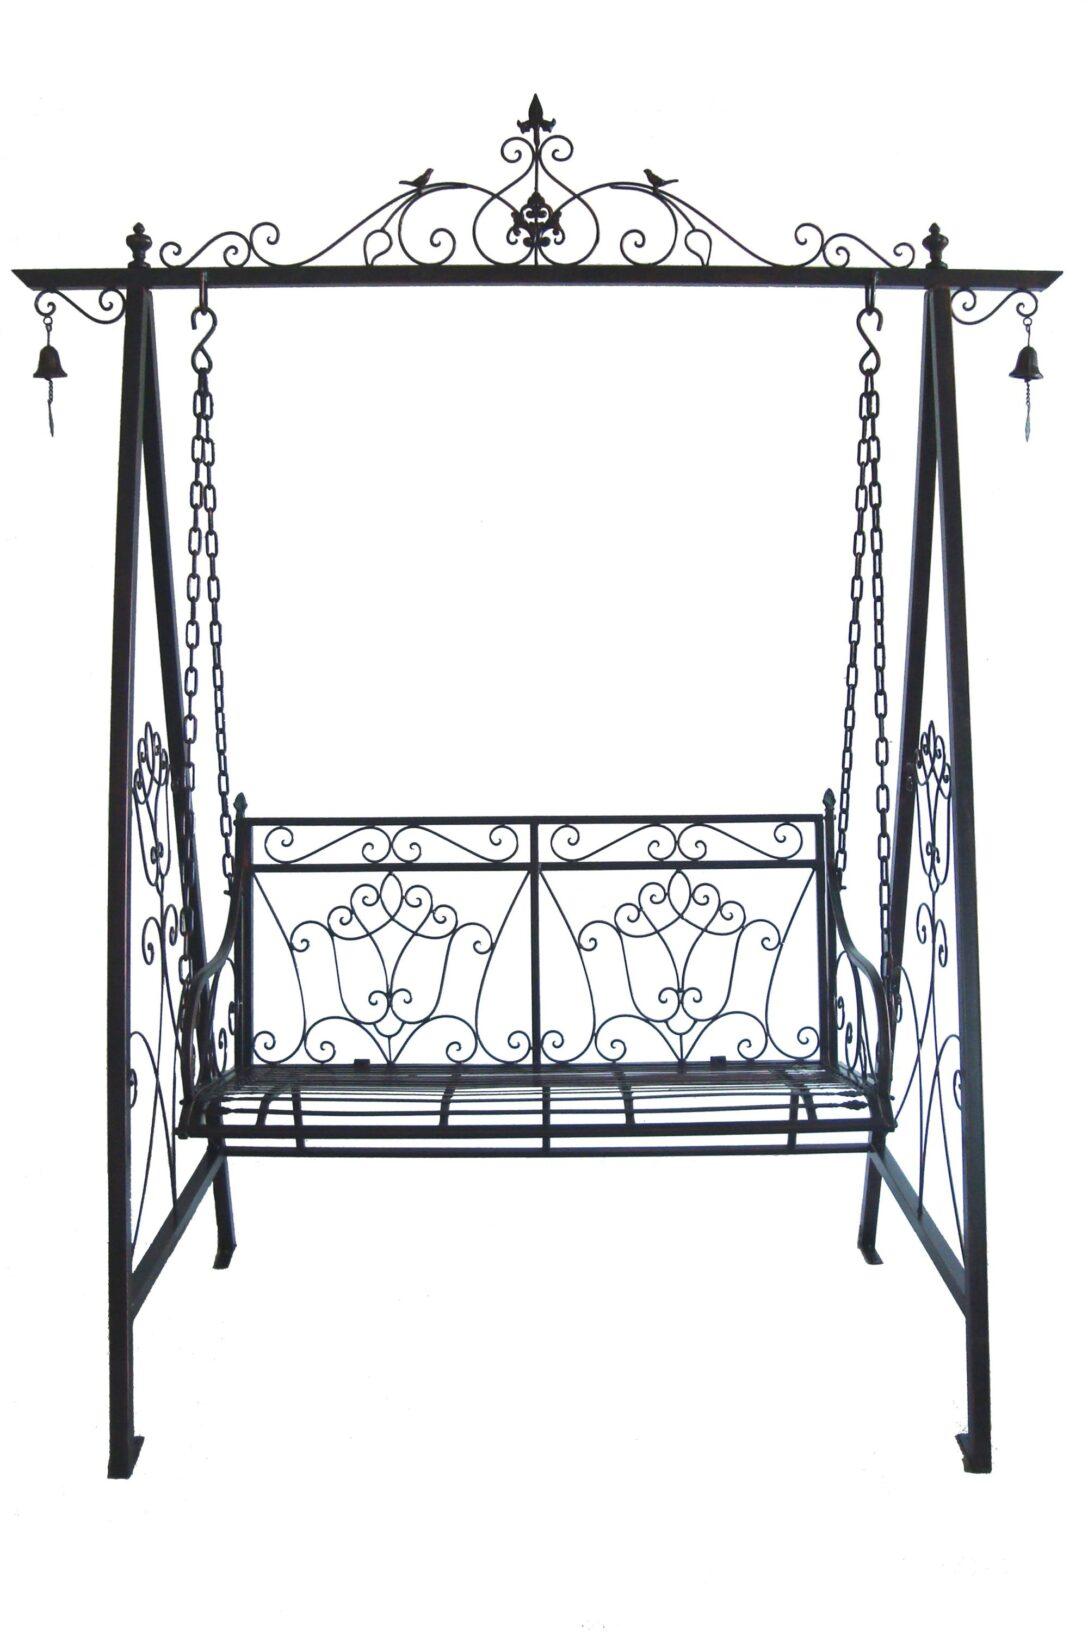 Large Size of Metall Hollywoodschaukel Schaukel Gartenschaukel Antik Vintage Bett Regale Regal Weiß Wohnzimmer Gartenschaukel Metall